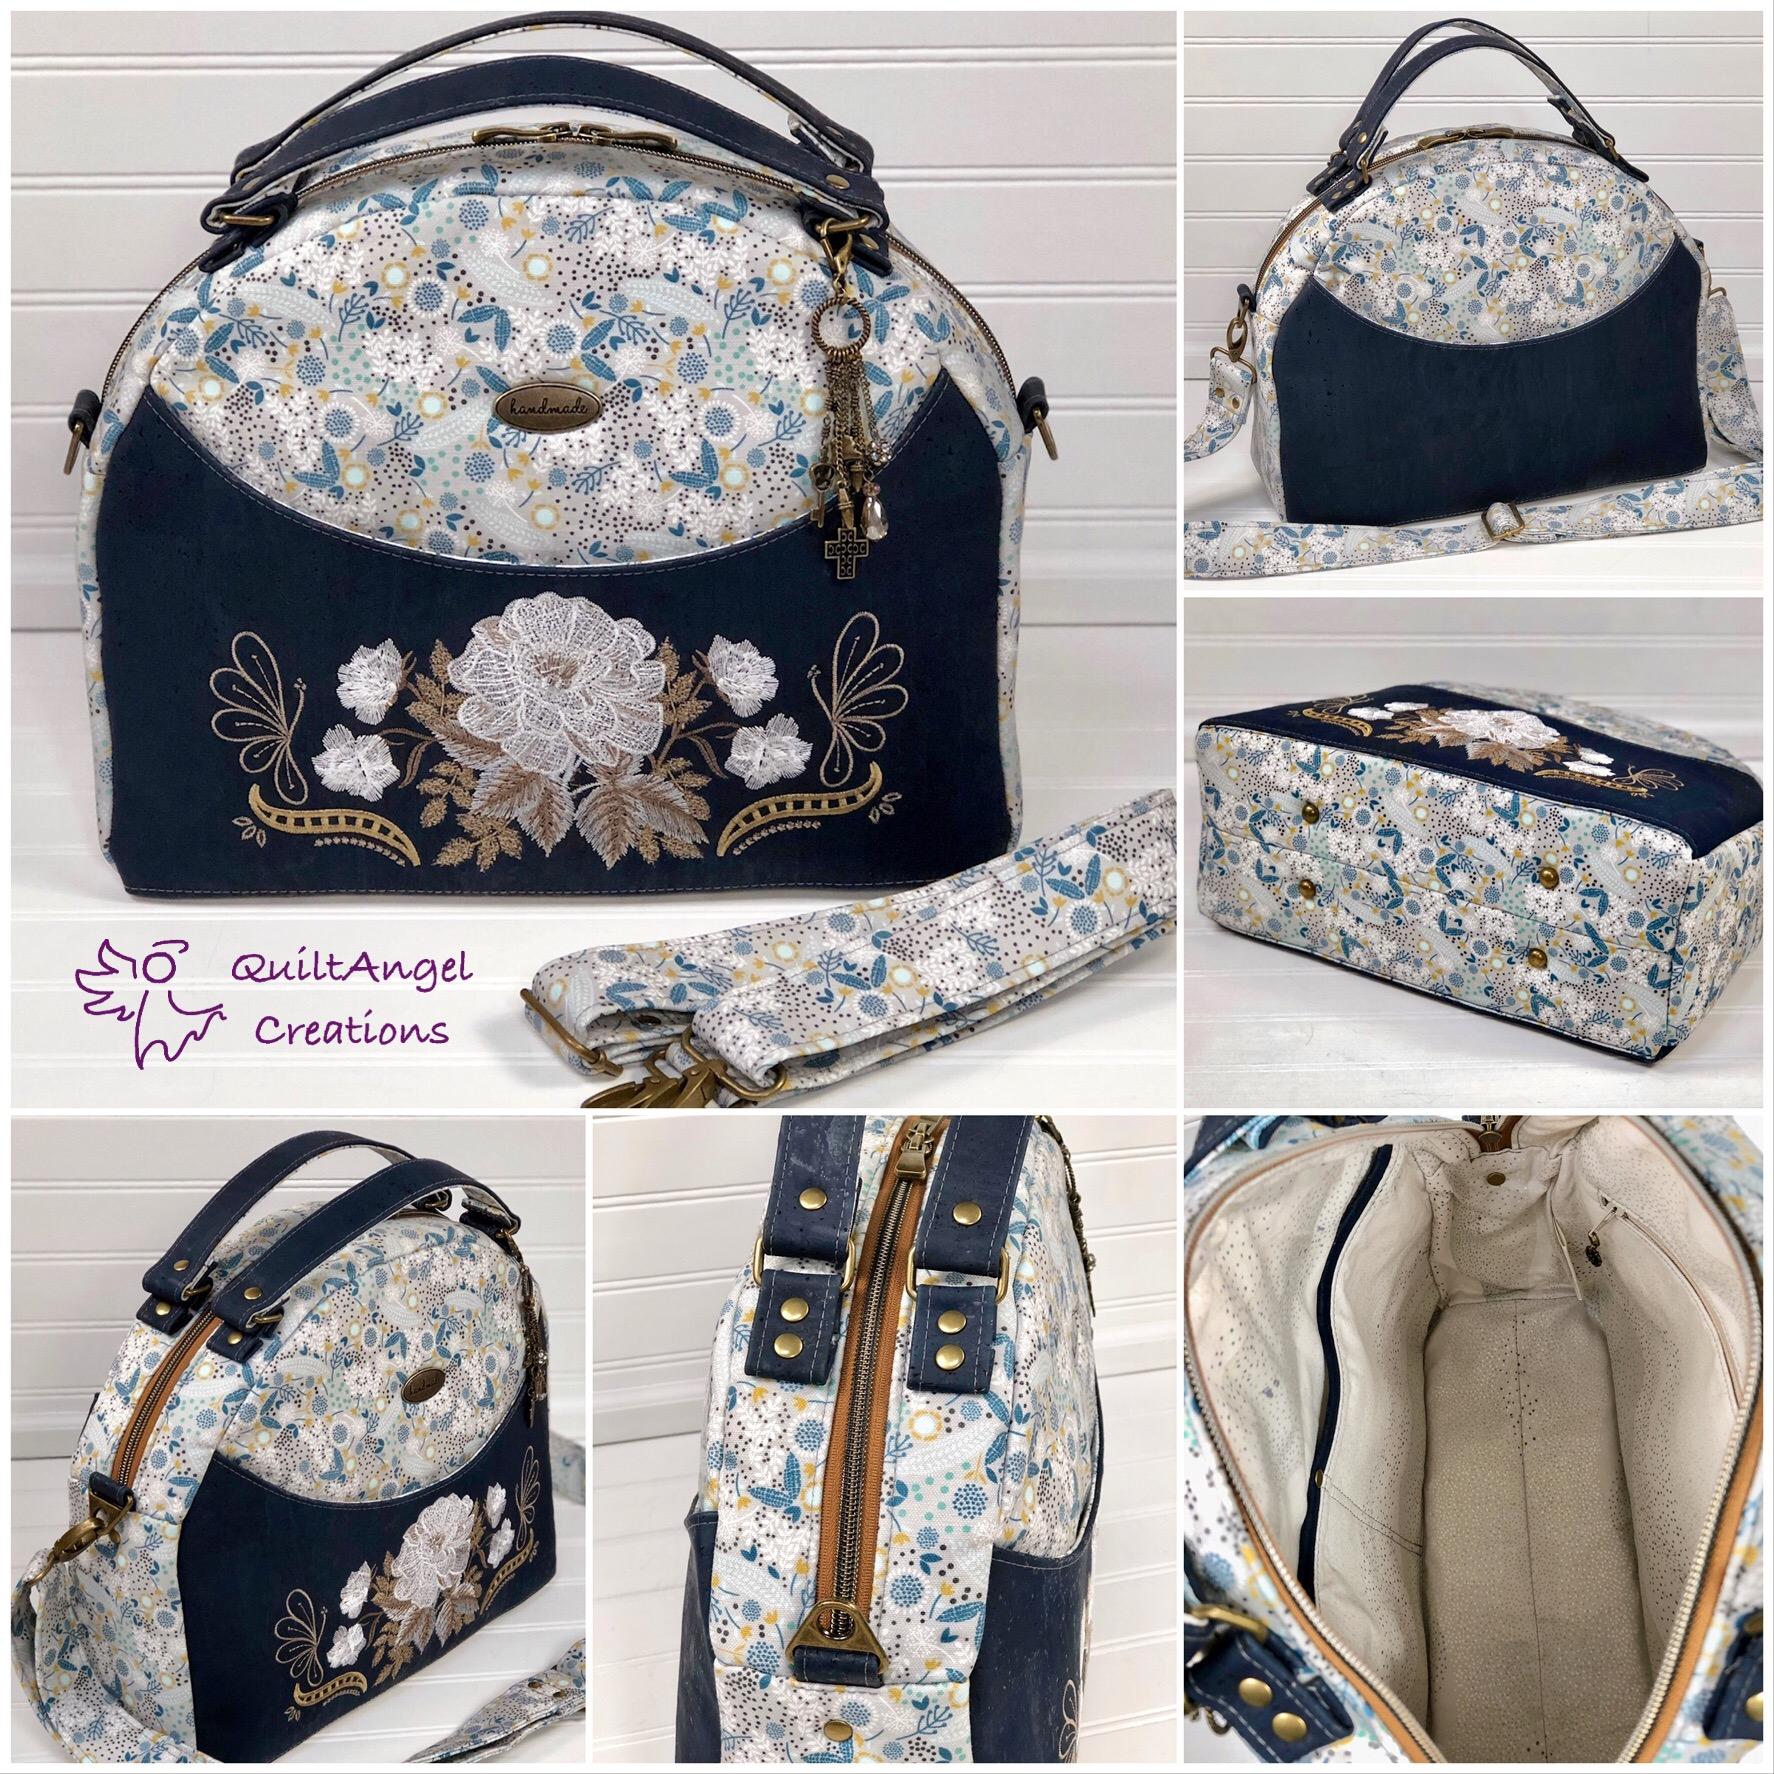 Elizabeth Widmayer's Bowler Bag